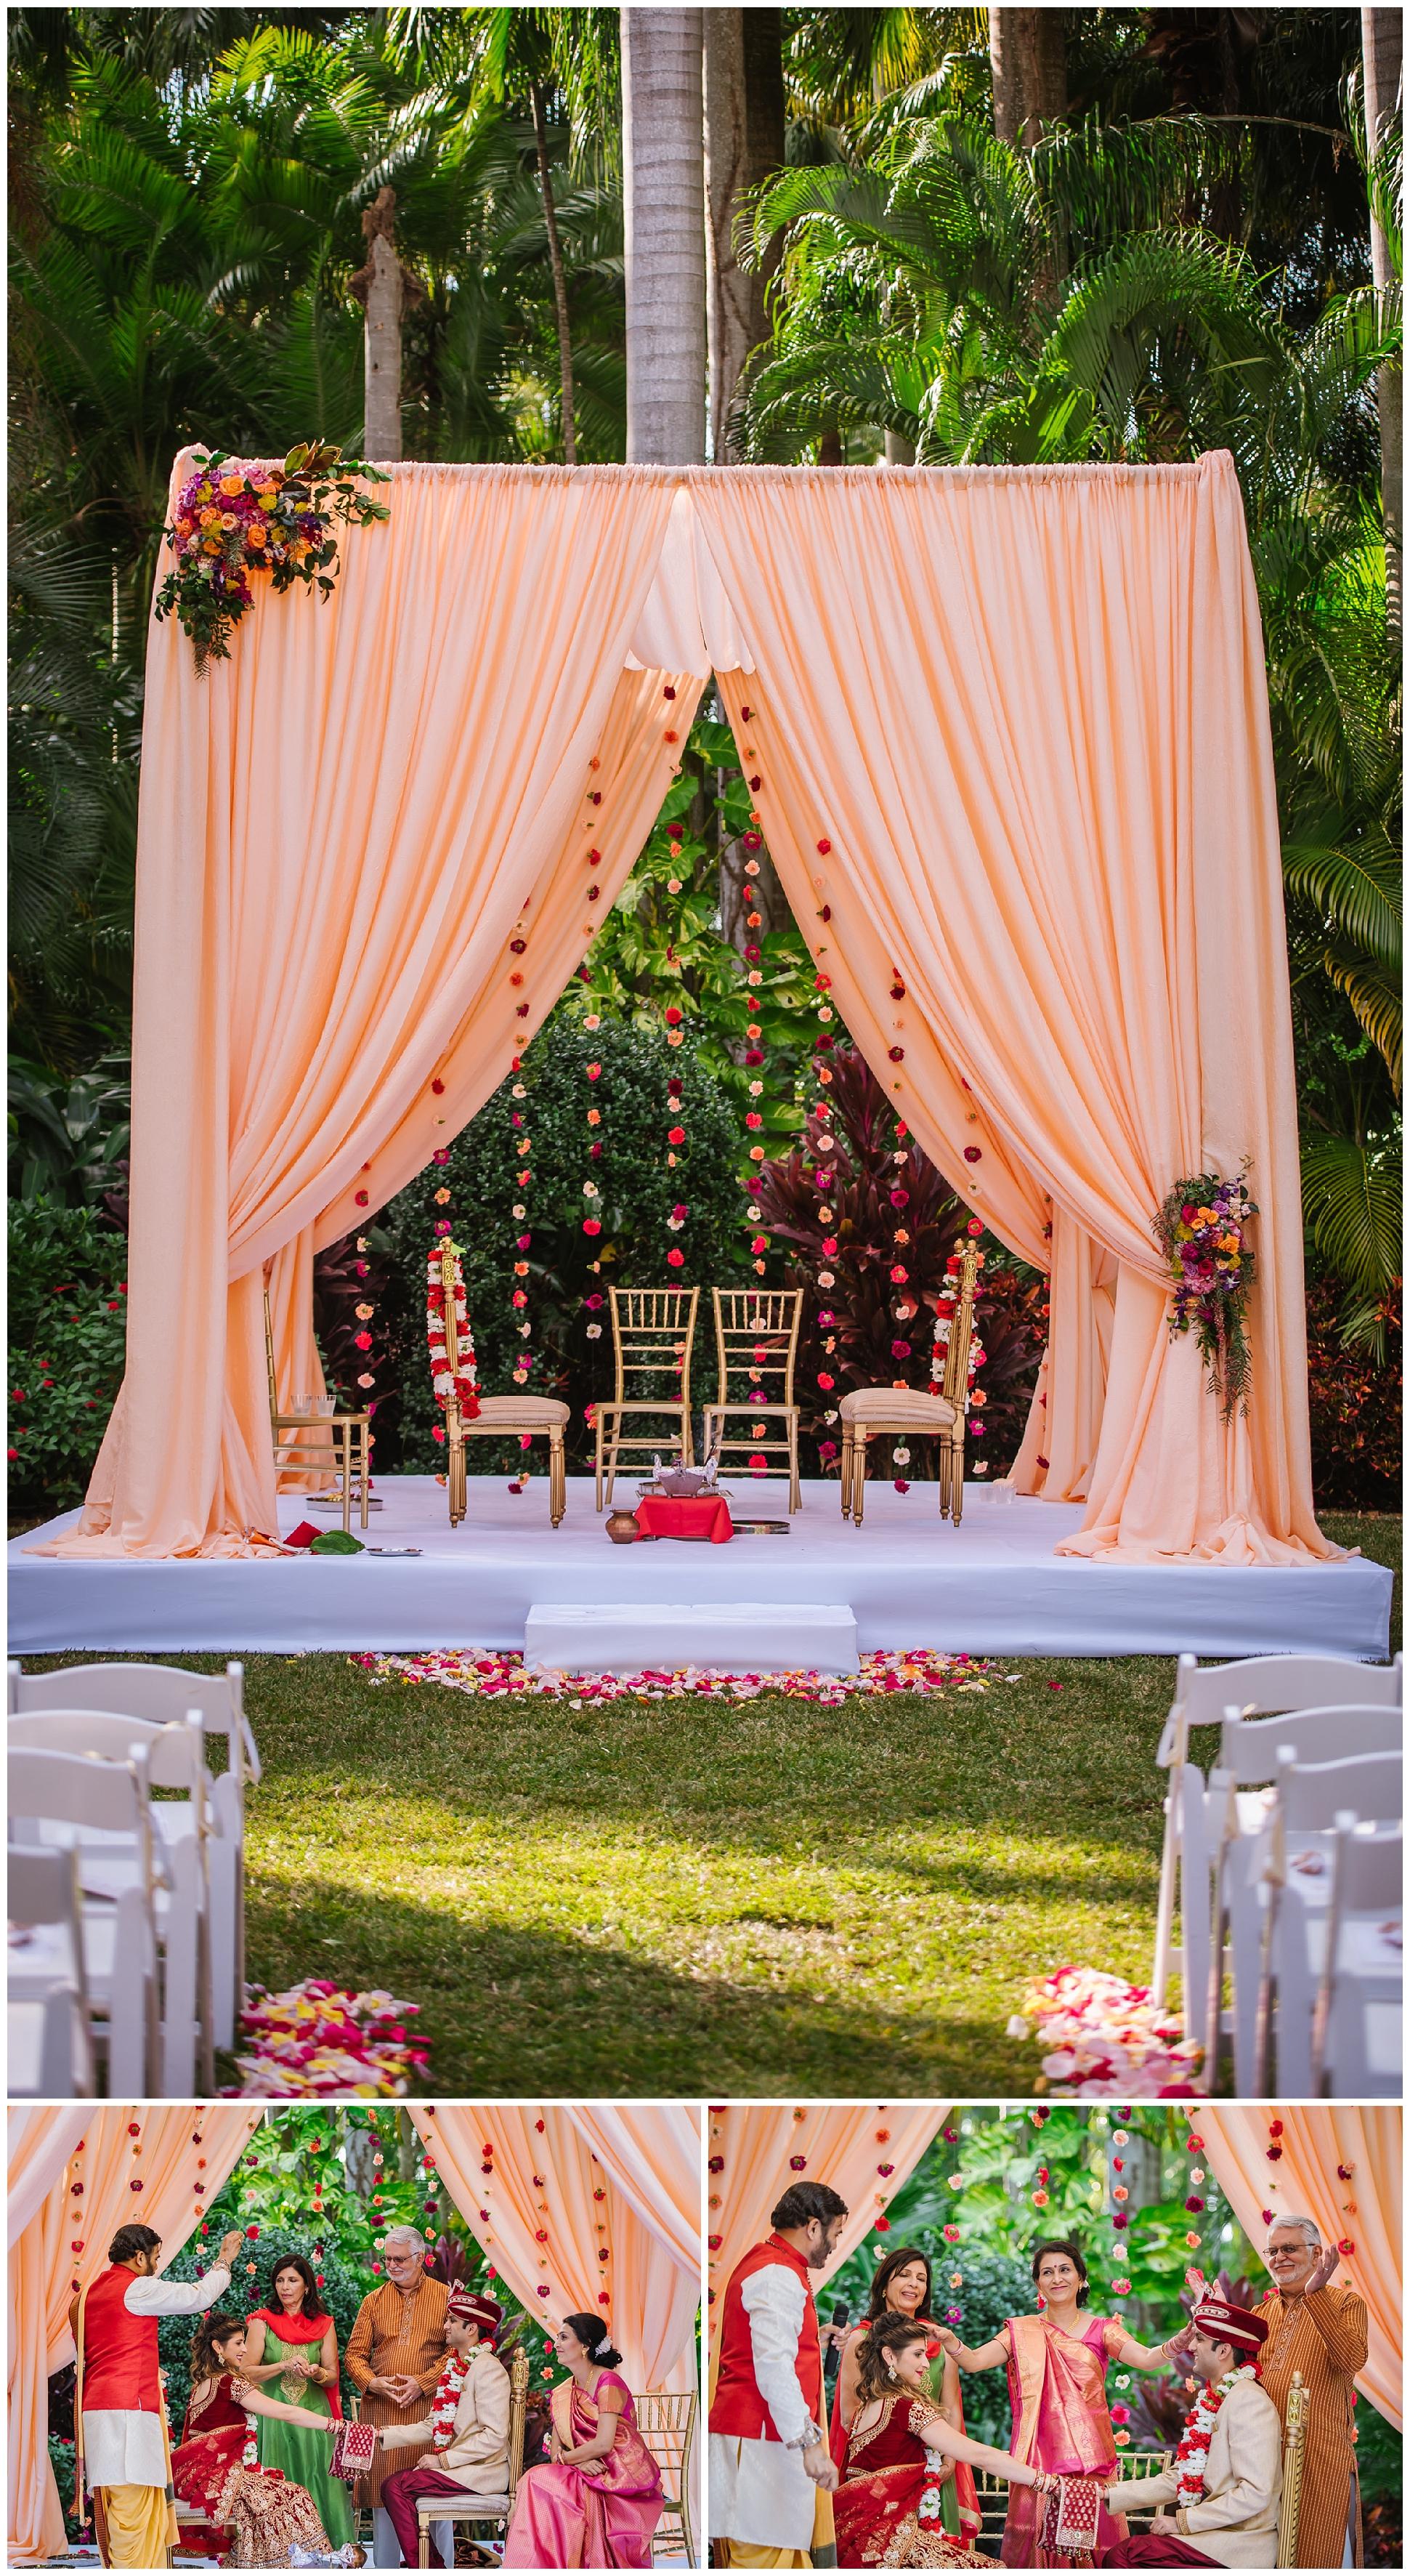 Ashlee-hamon-photography-year-in-review-2016-travel-wanderlust-vsco-adventure-wedding_0028.jpg